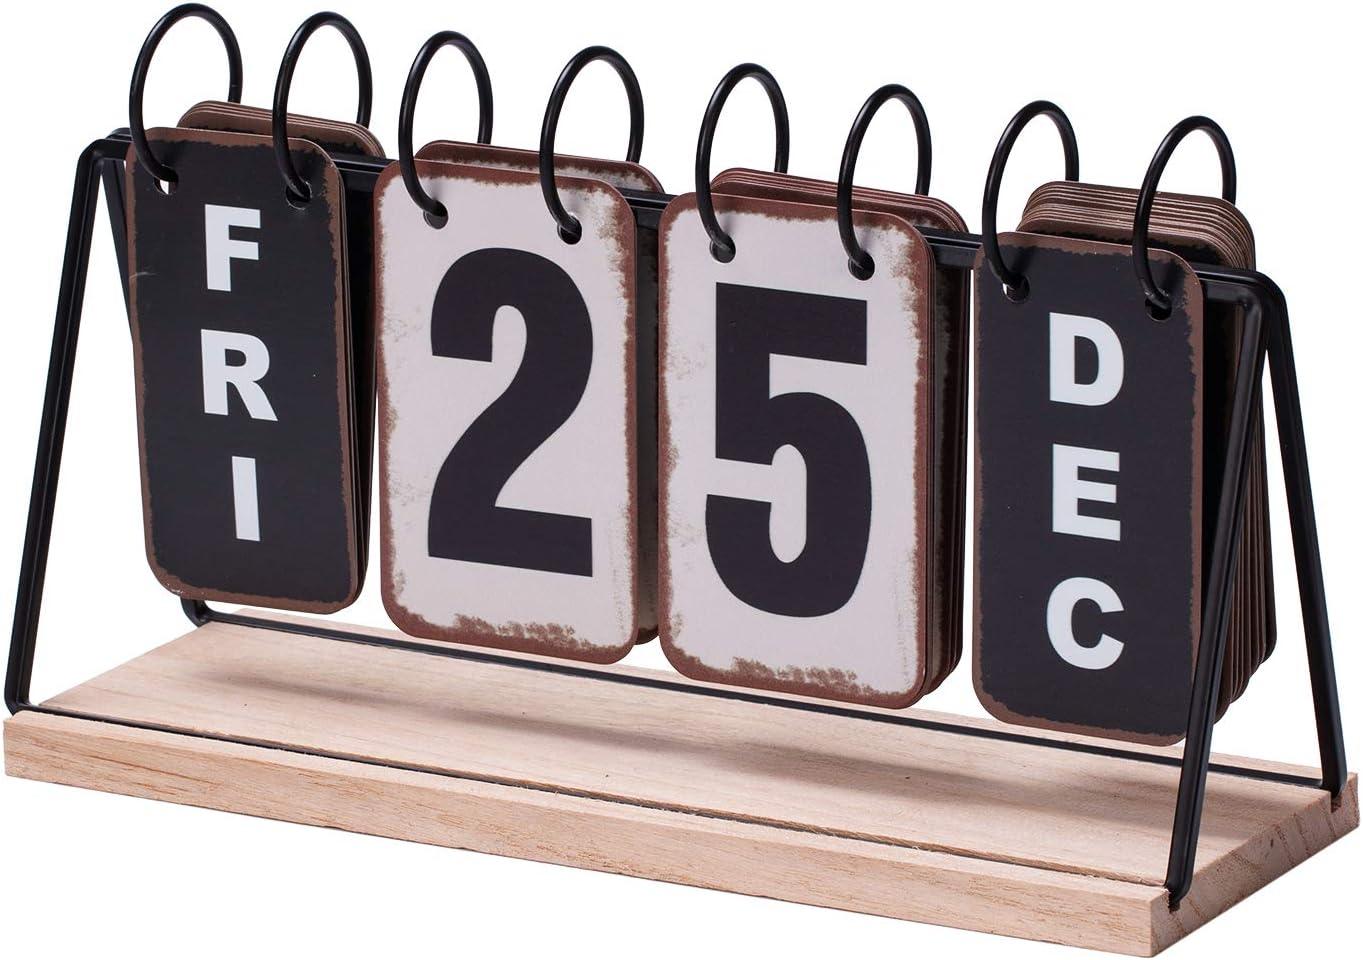 Daily Office Metal Flip Desk Calendar Perpetual Wood Vintage Calendar For Home Decor - Monthly Weekly Year Planner Standing Kitchen Desk Decor Wood Calendar